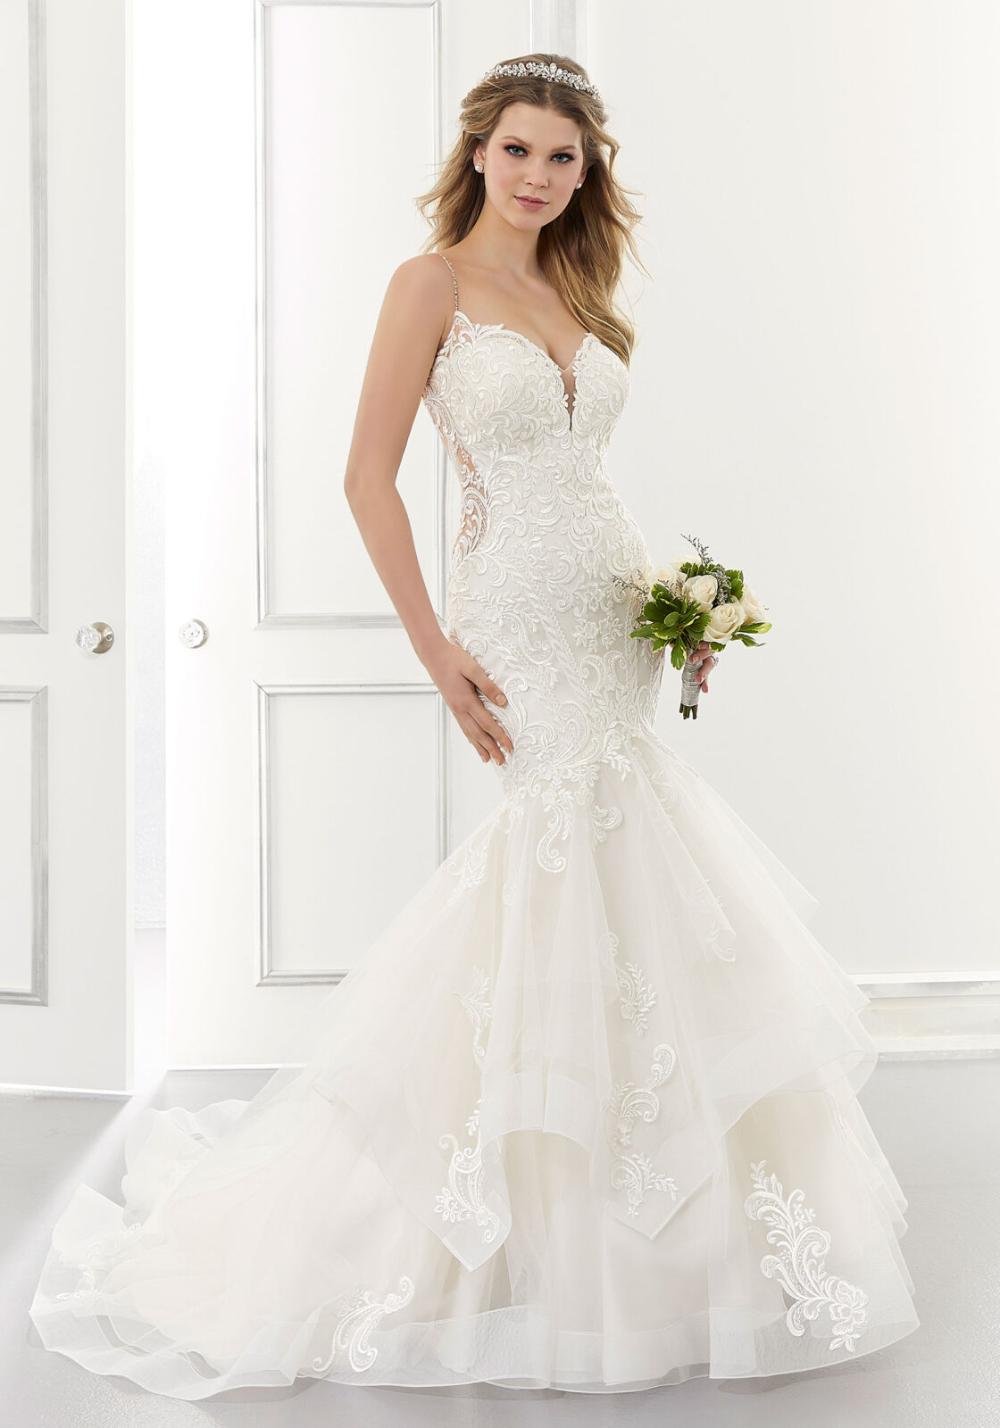 Alexis Wedding Dress Morilee Wedding Dress Store Lace Mermaid Wedding Dress Wedding Dresses Photos [ 1428 x 1000 Pixel ]